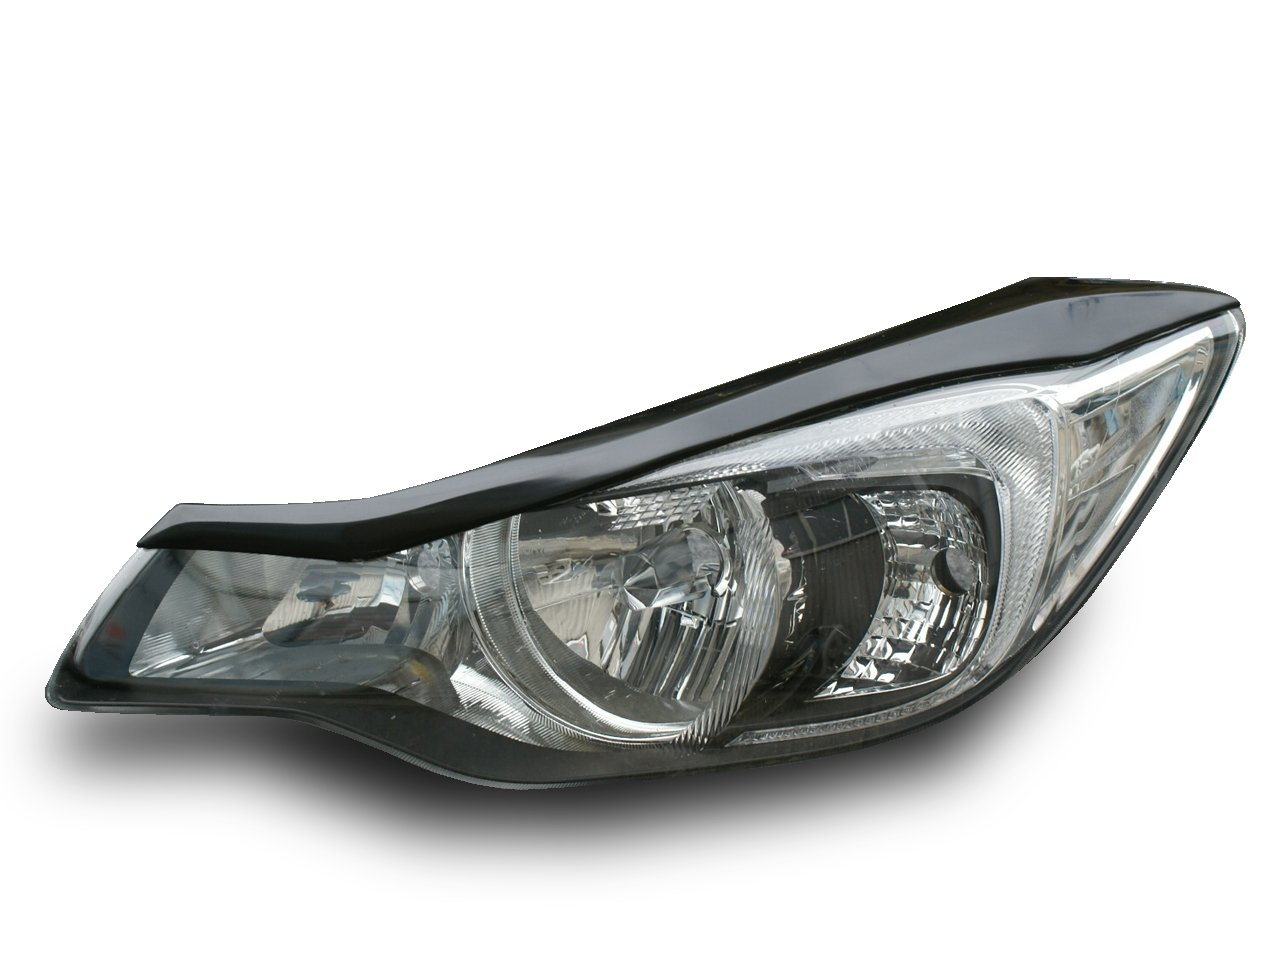 AMS 【日本製】 スバル インプレッサGP/GJ系 2011/11~ XV GP系 2012/10~アイラインガーニッシュ  素地 未塗装品 黒ゲルコート仕上げ 簡単装着[1B06063] 1B06063 B014FDHZR8